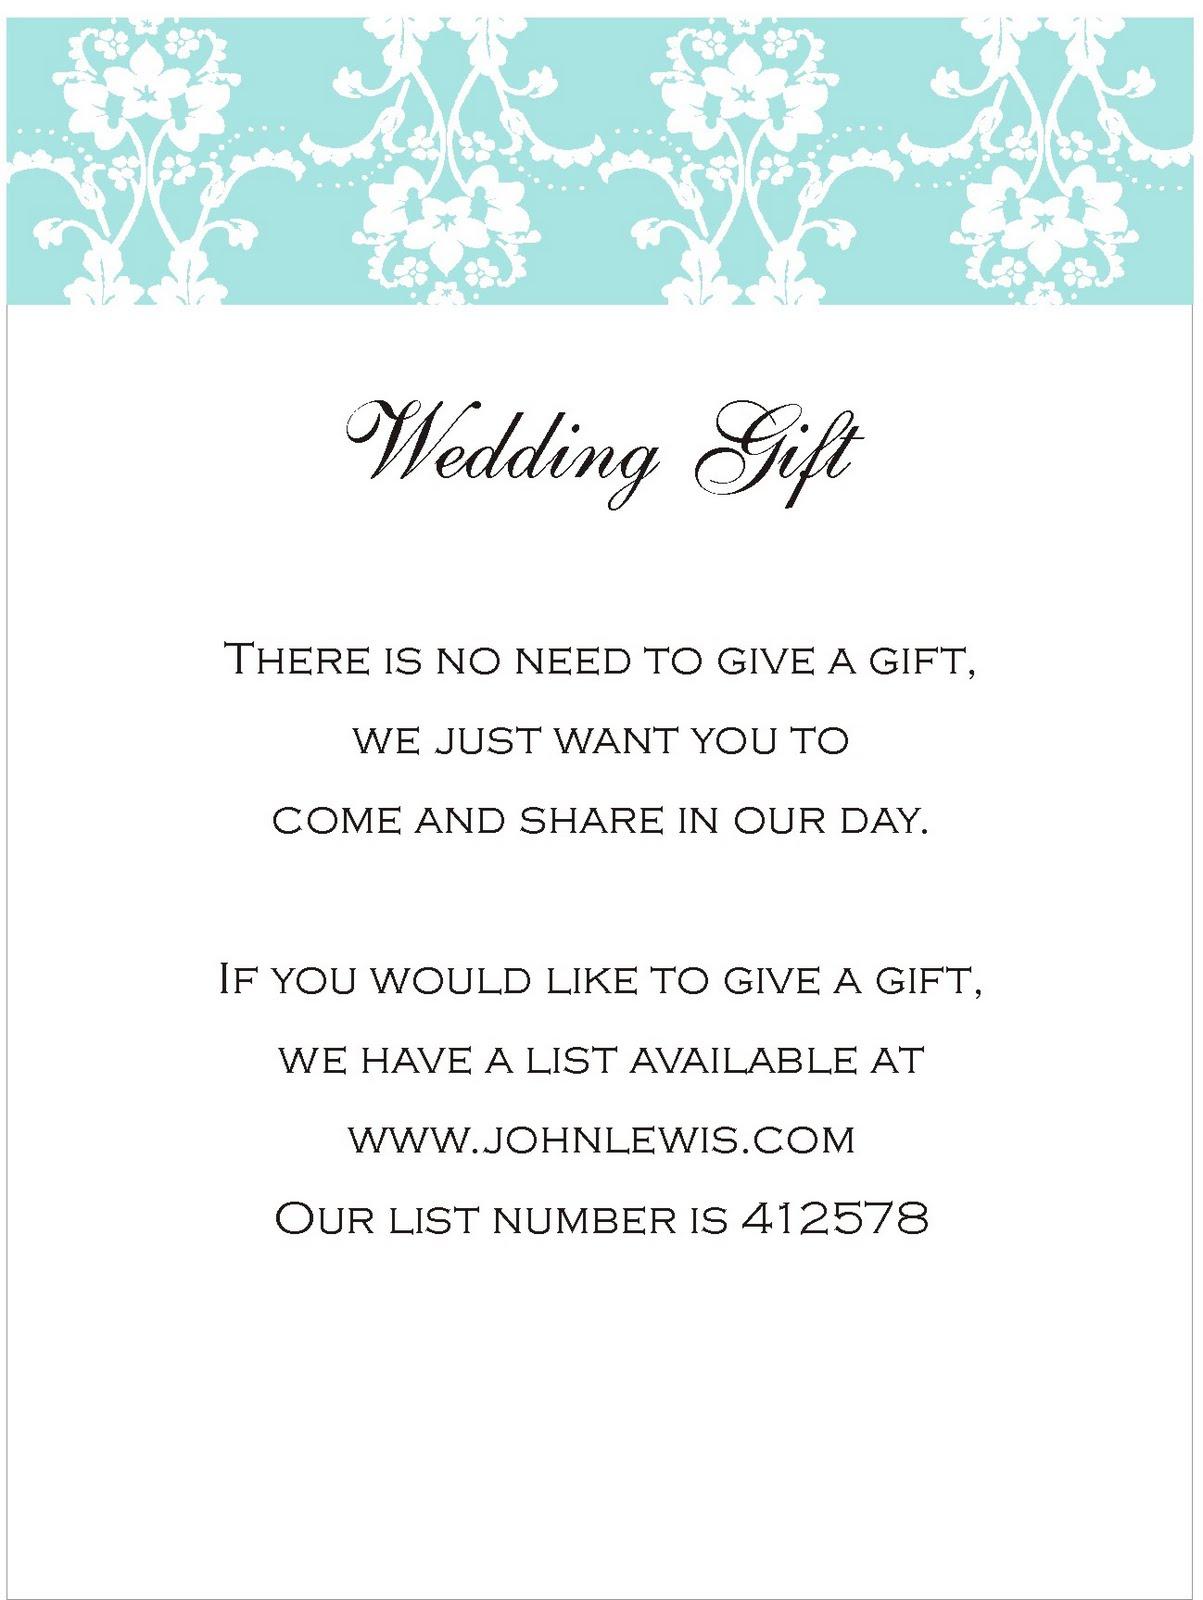 Wedding Gift Thank You Wording Photo Album Weddings Center – Sample Wedding Thank You Card Wording for Money